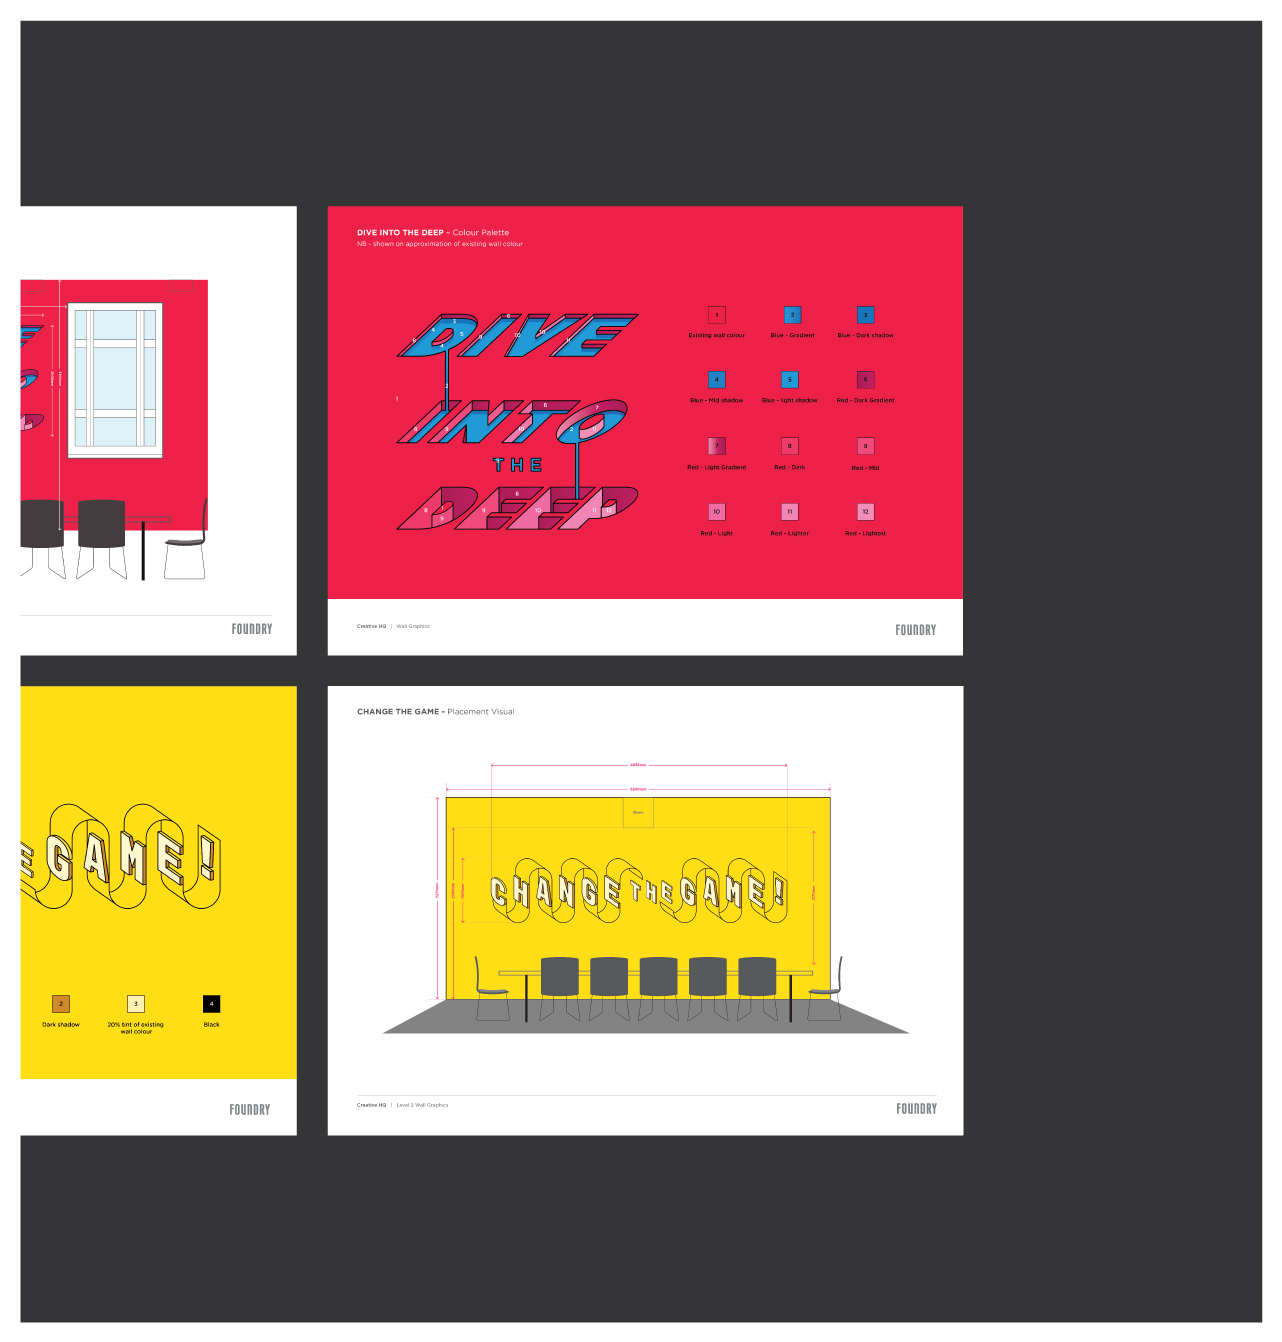 chq-headquarters-design-web-14.jpg